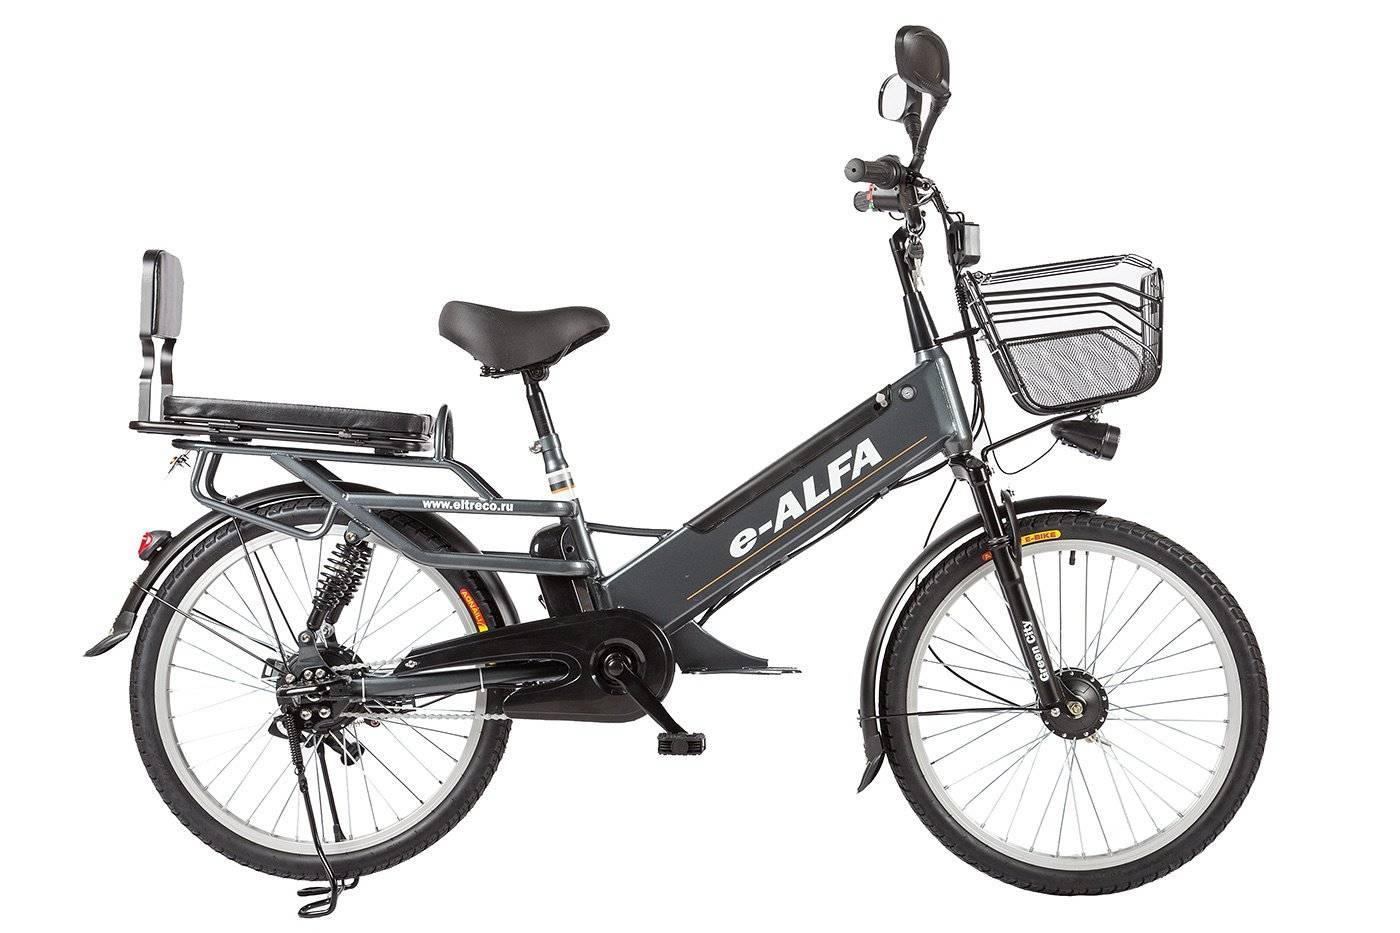 Велогибрид Eltreco e-ALFA L 350W, 010823-0083, фото 5